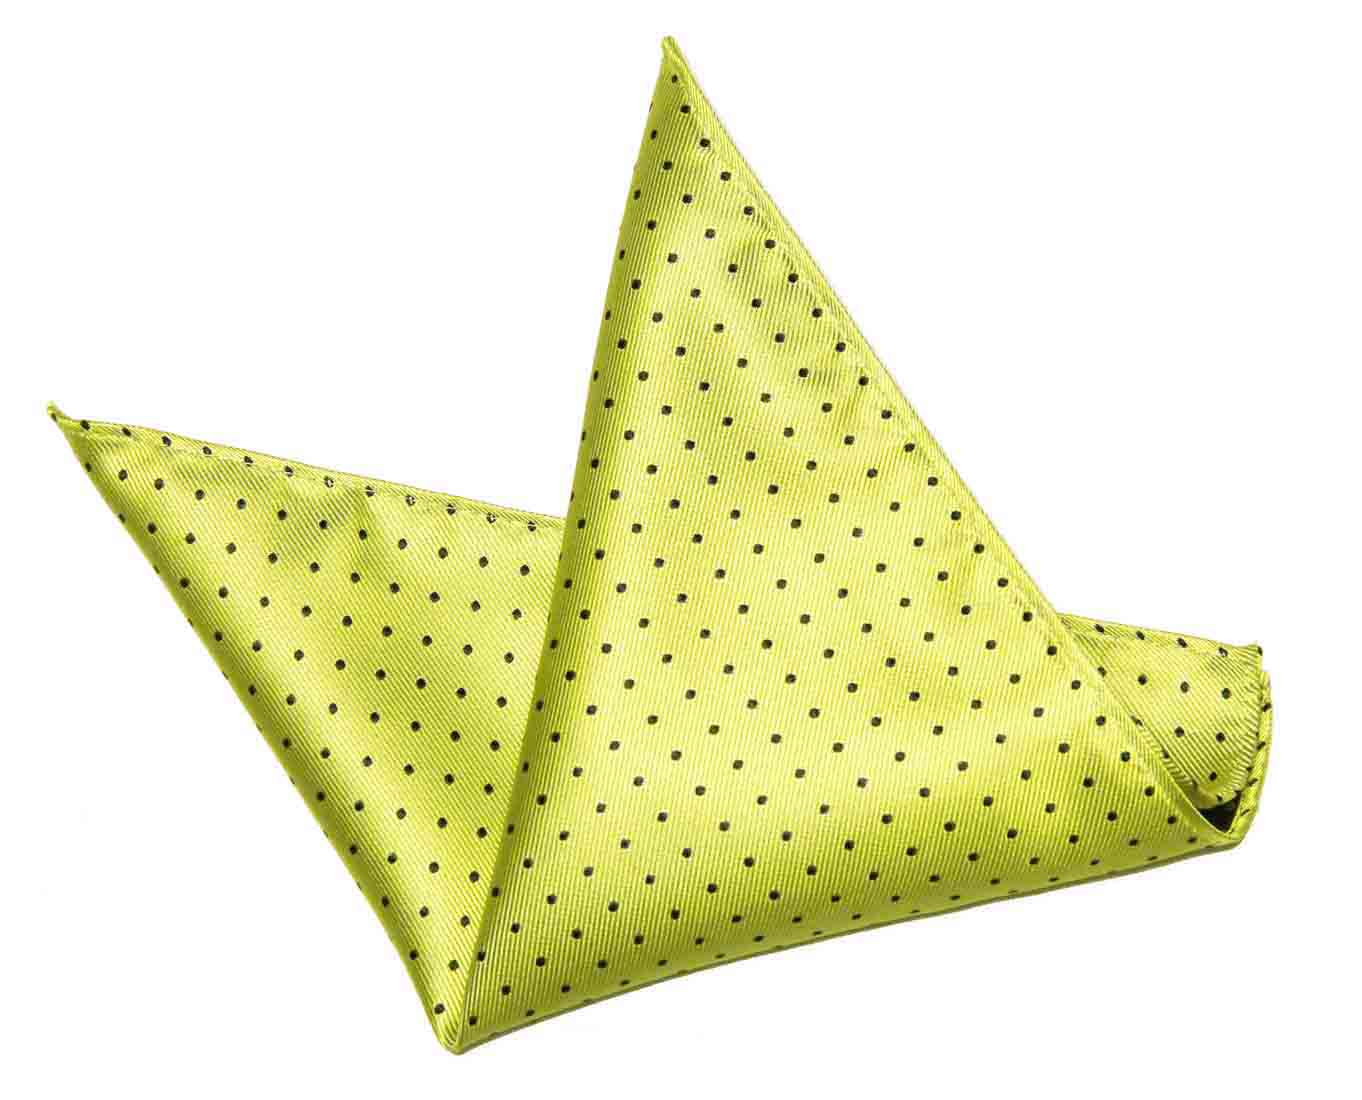 ekSel Pocket Square Yellow Black Polka Dots Silk Blend Men's